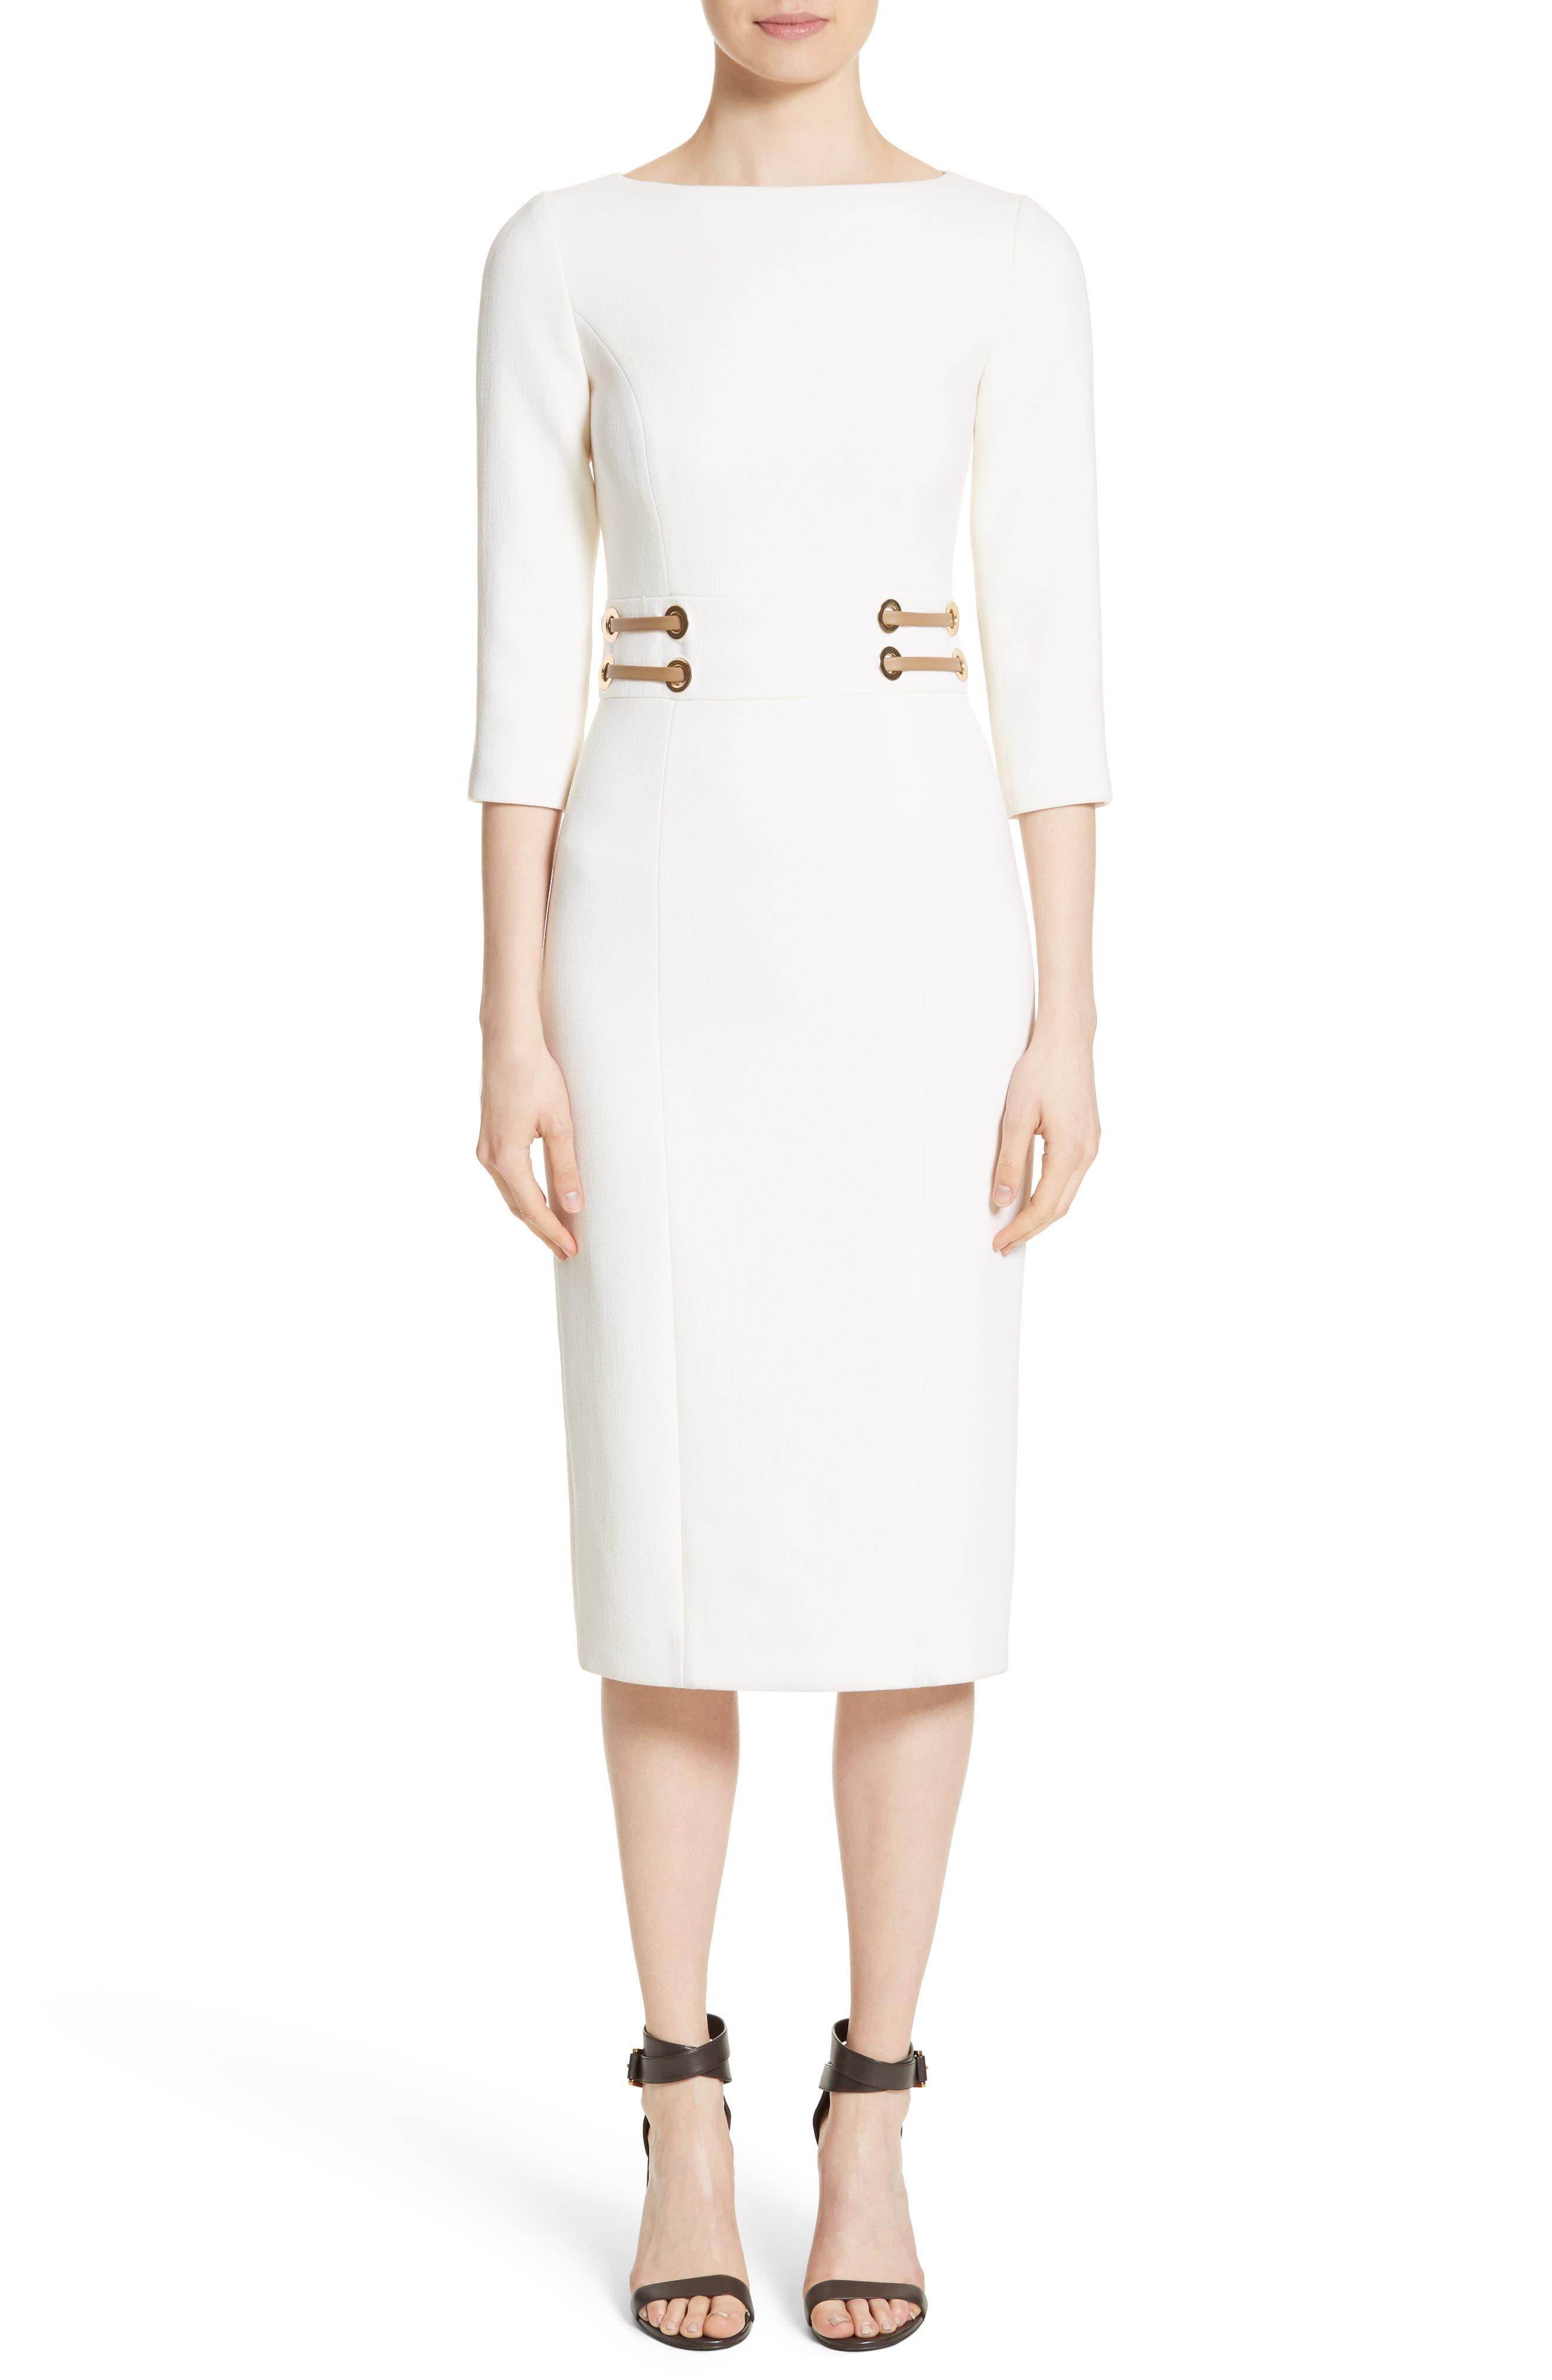 Michael Kors Leather Trim Stretch Bouclé Crepe Sheath Dress